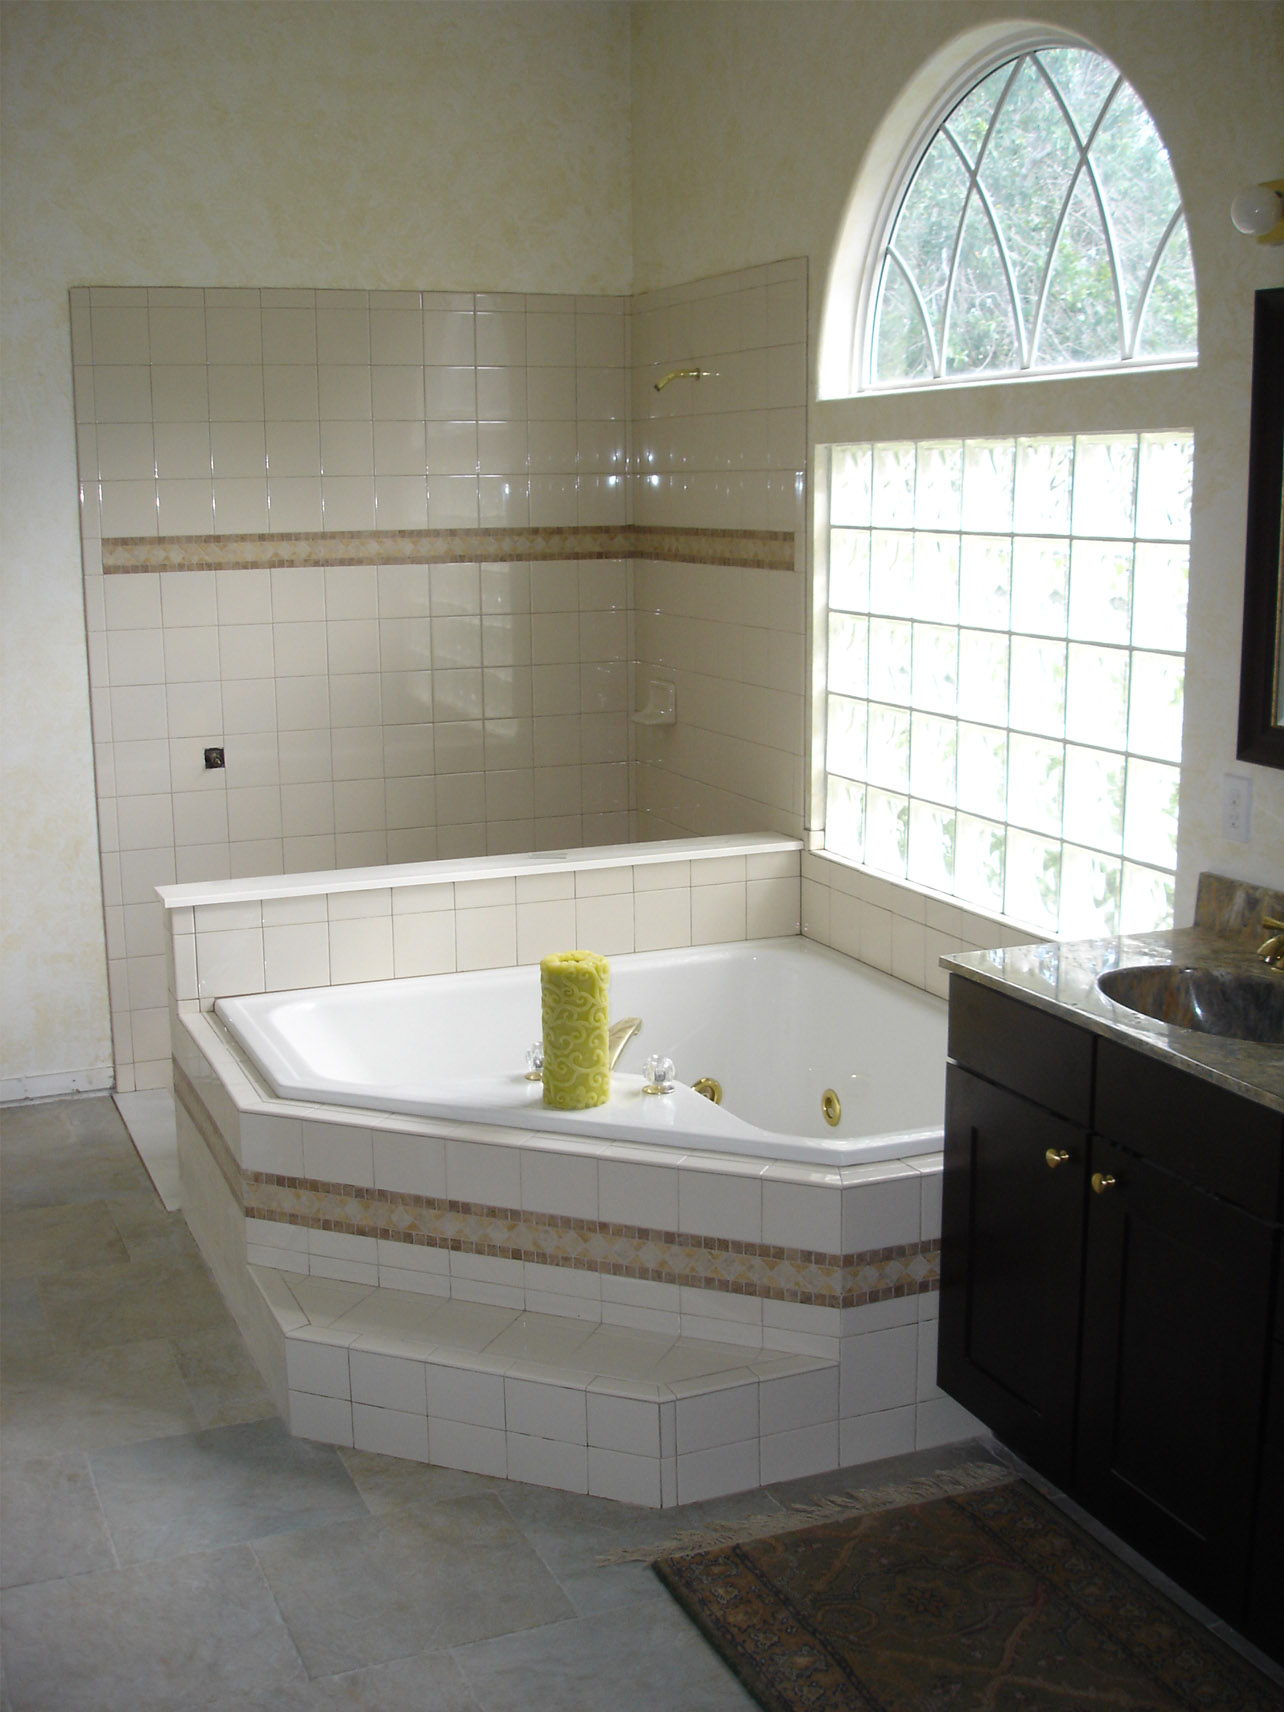 Shower and garden tub with almond 66 ceramic tile  Tek